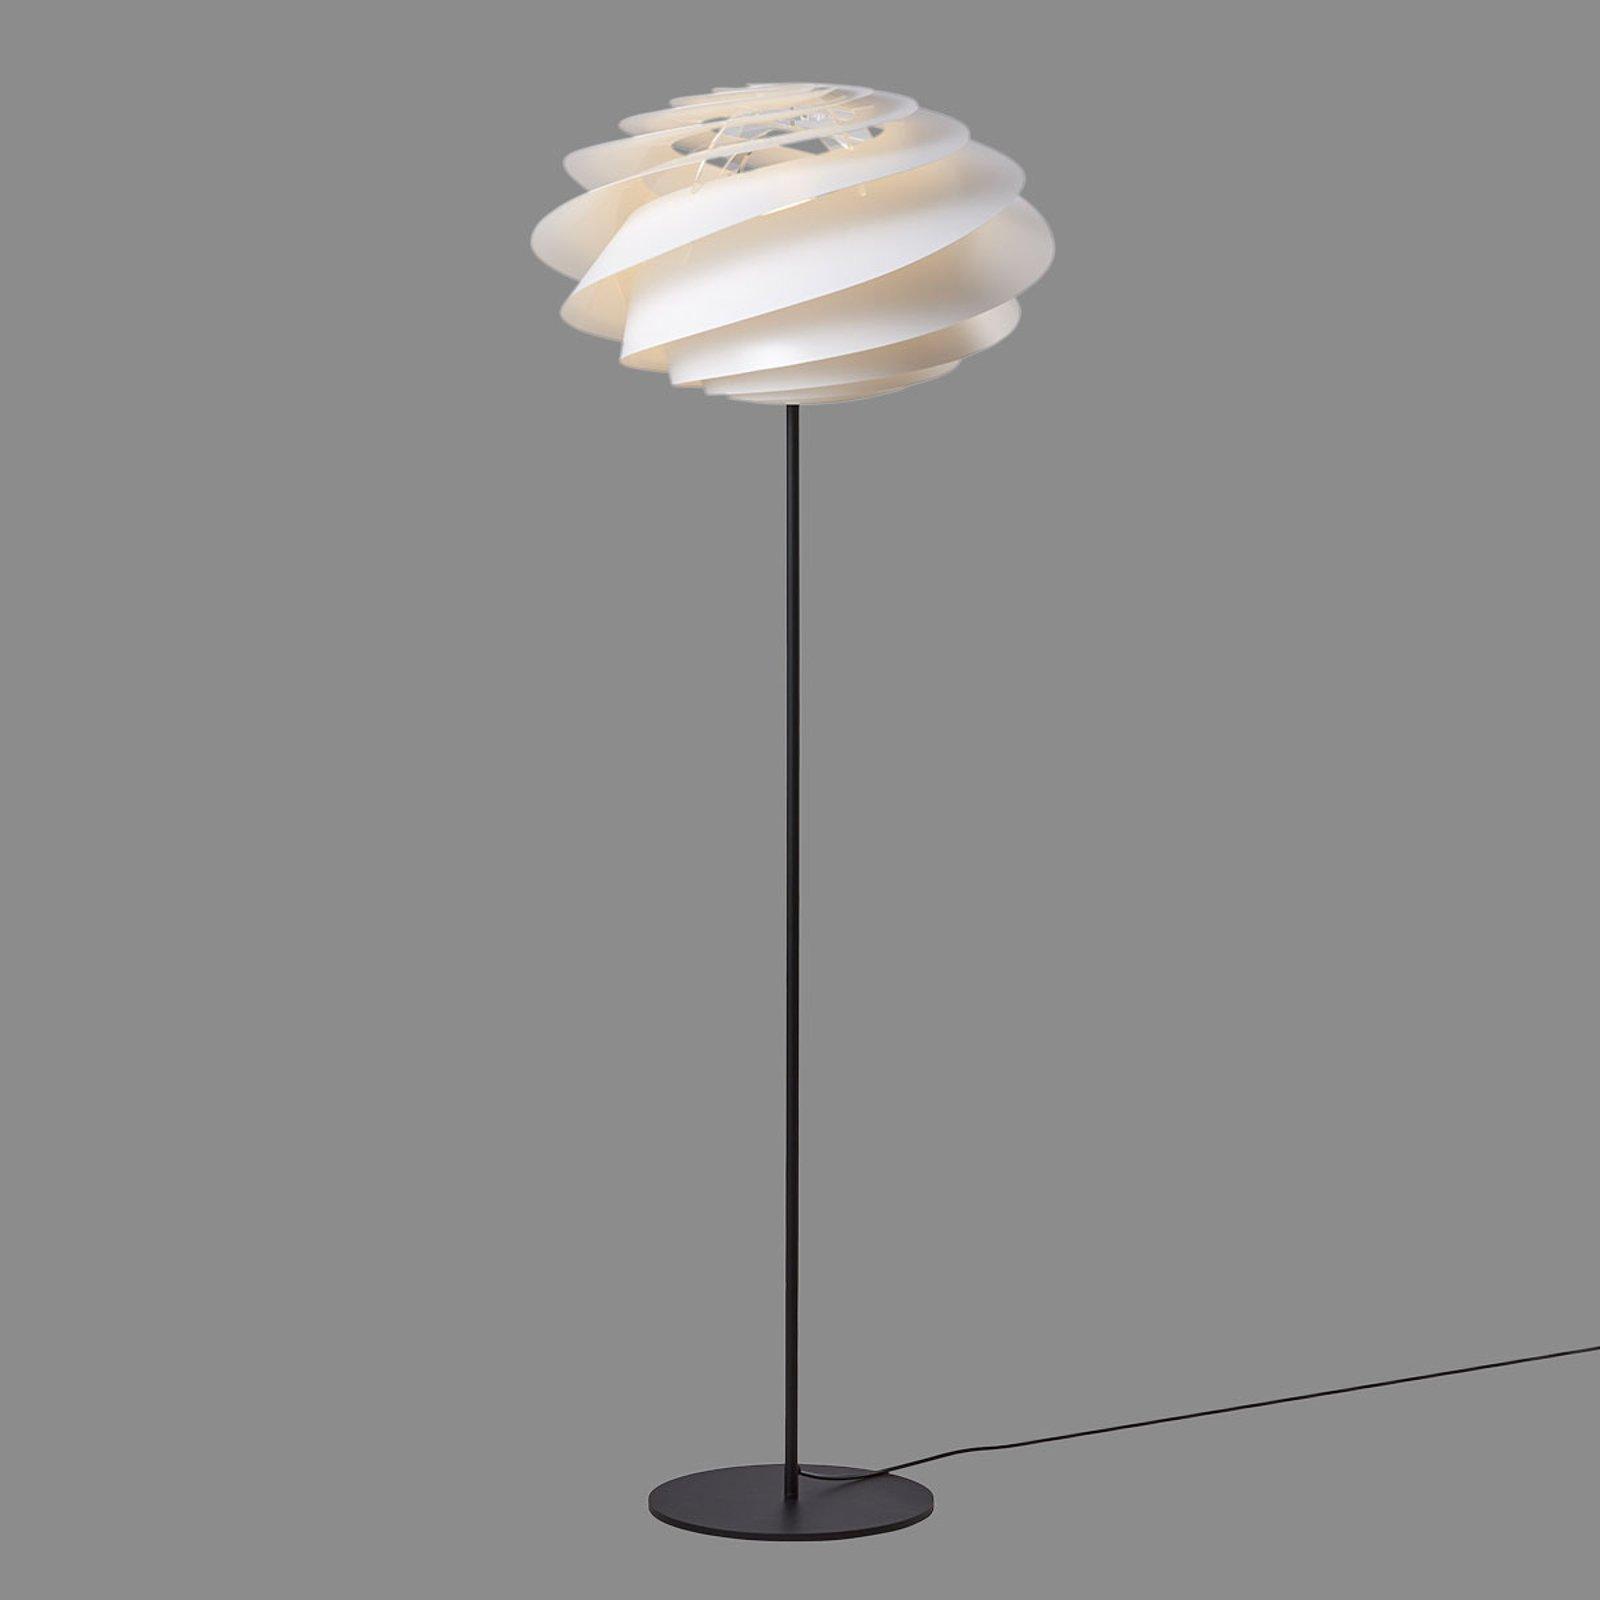 LE KLINT Swirl - hvit designer-gulvlampe